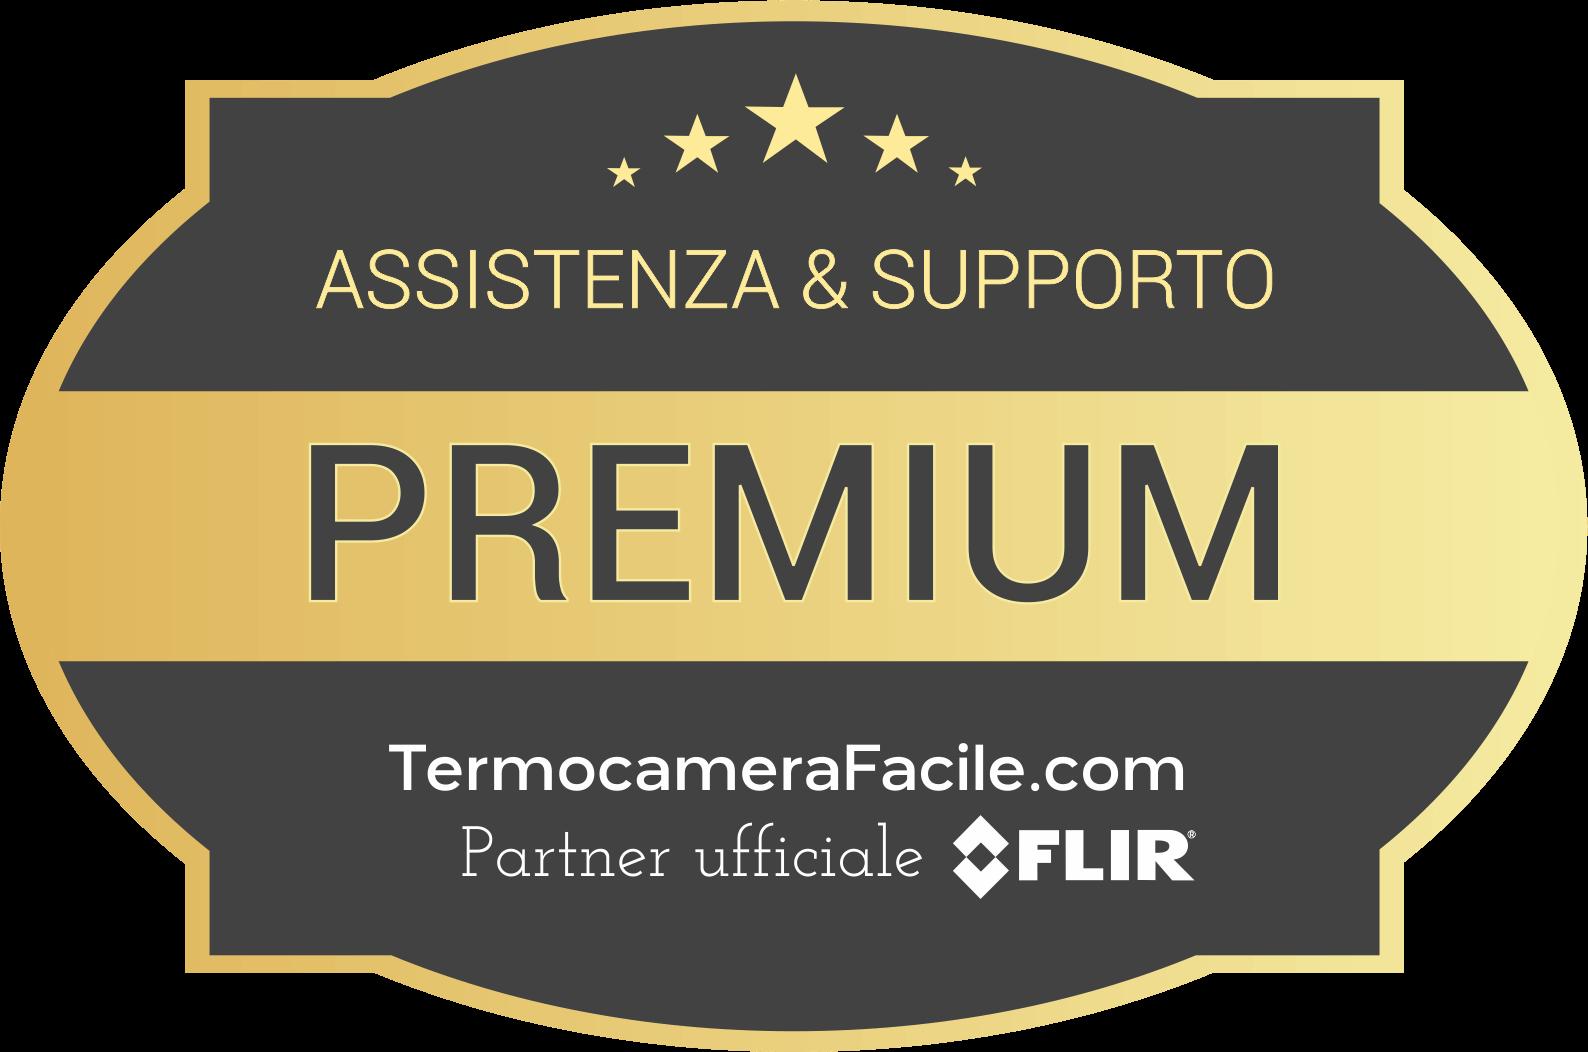 Assistenza Premium Termocamerafacile